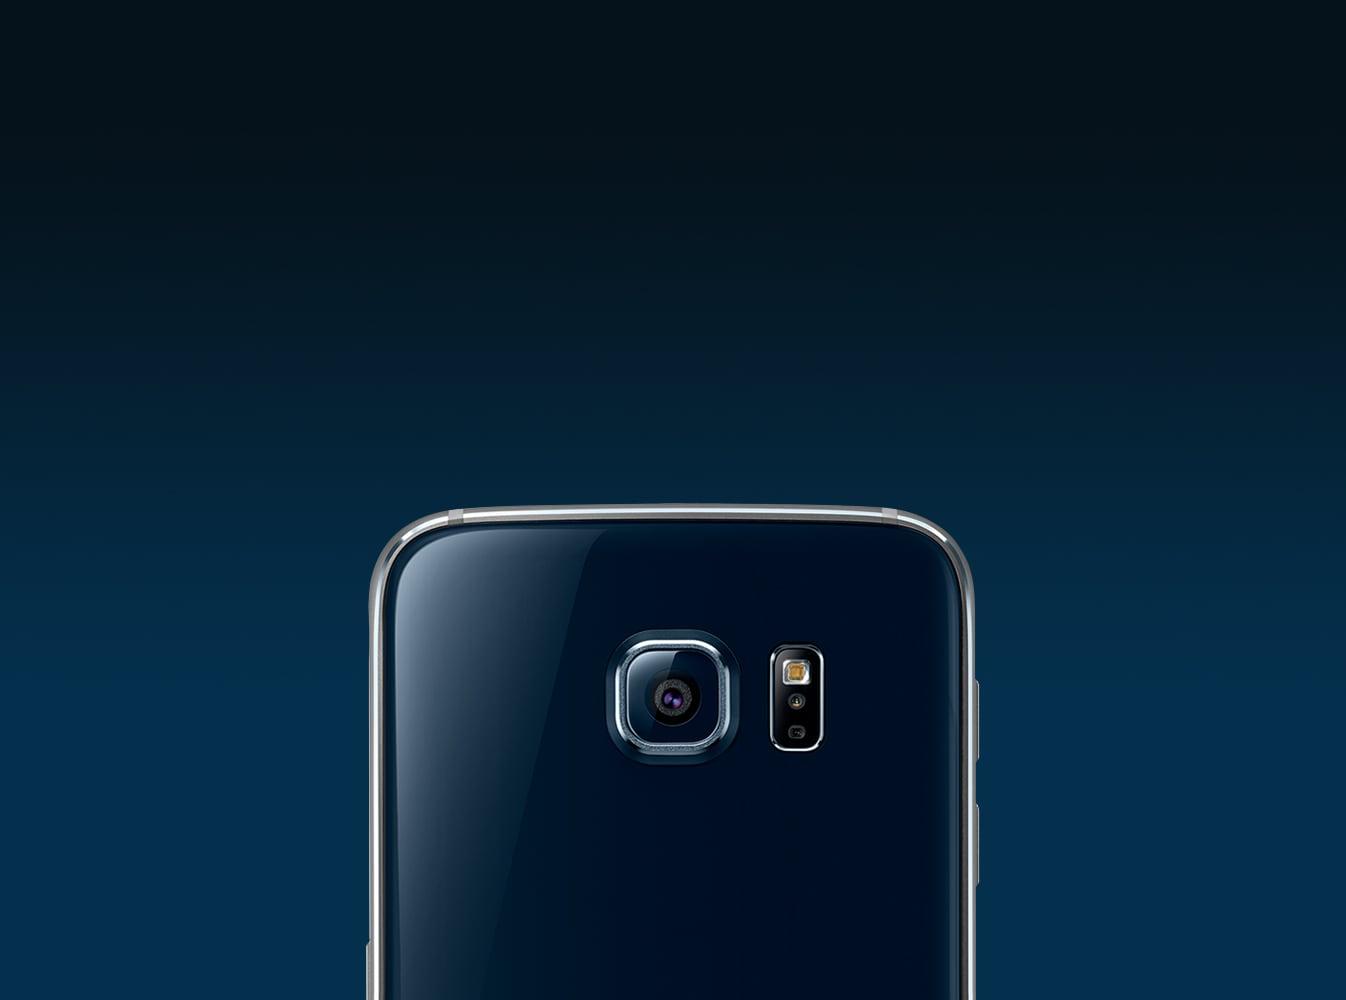 Samsung Galaxy S6 Camera Review